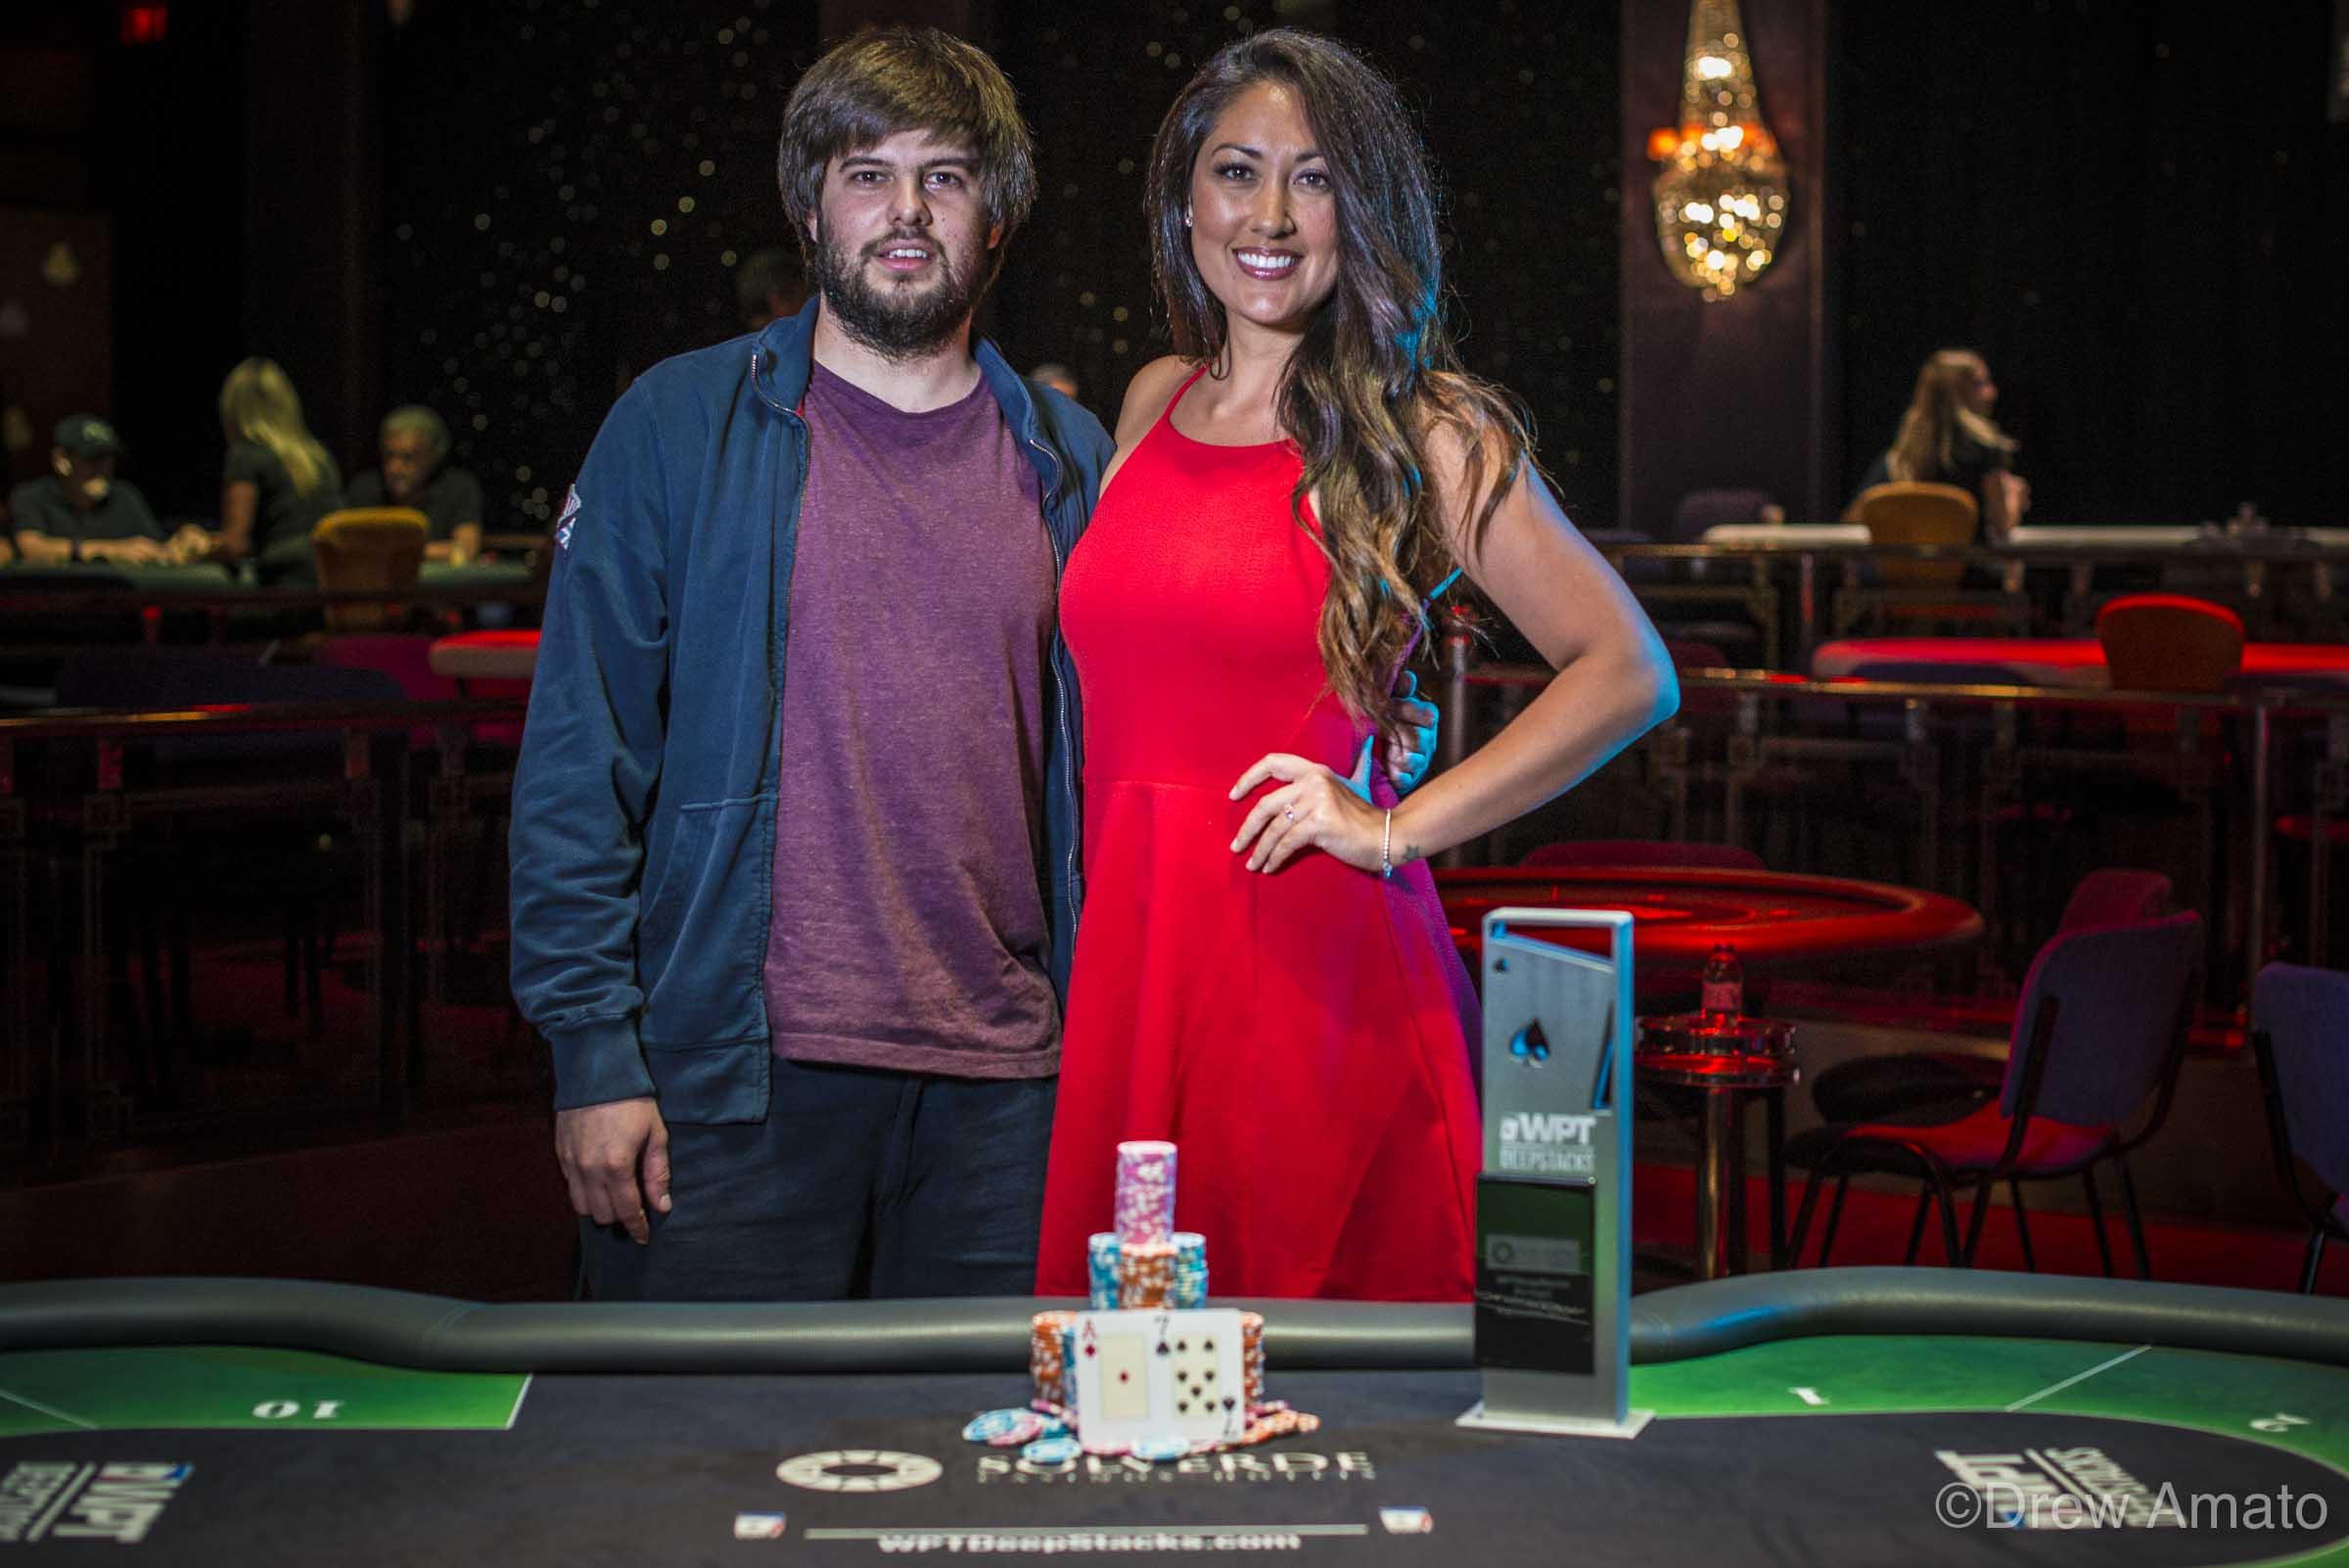 World Poker Tour_Francisco Lopes Wins WPTDS Portugal_DA60923.jpg